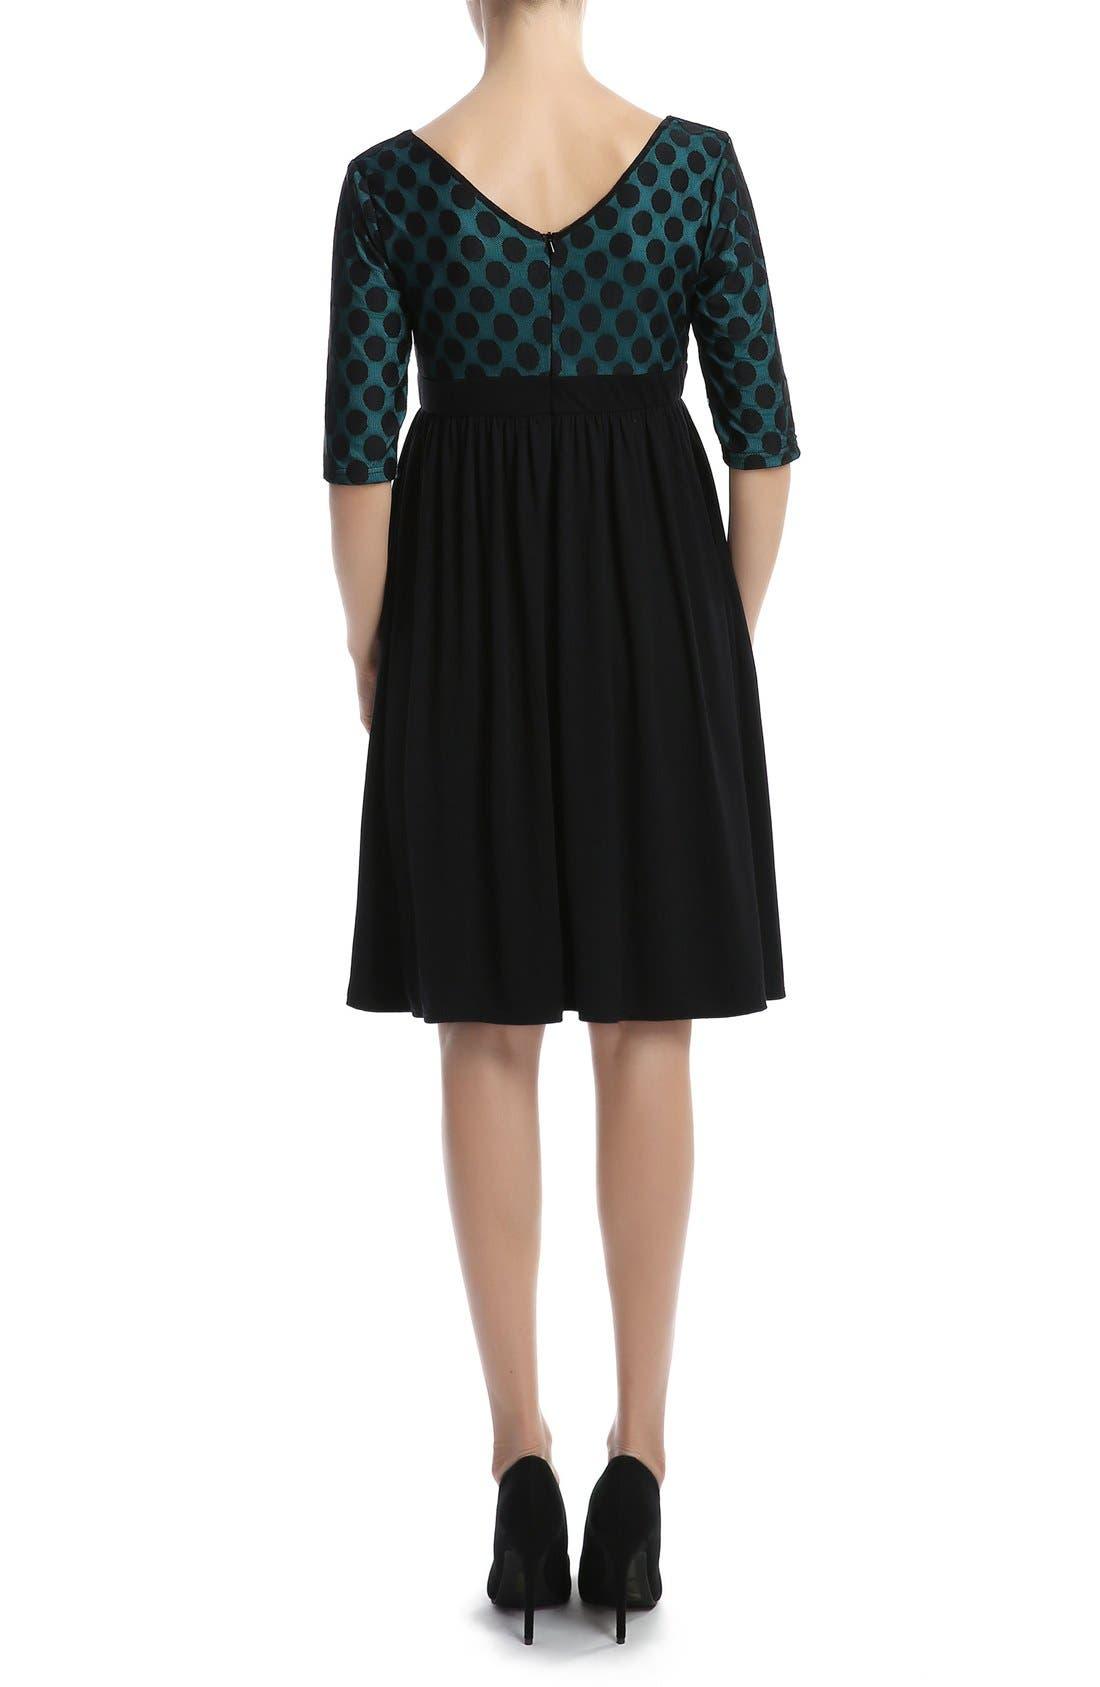 'Charlie' Maternity Dress,                             Alternate thumbnail 2, color,                             Black/ Teal